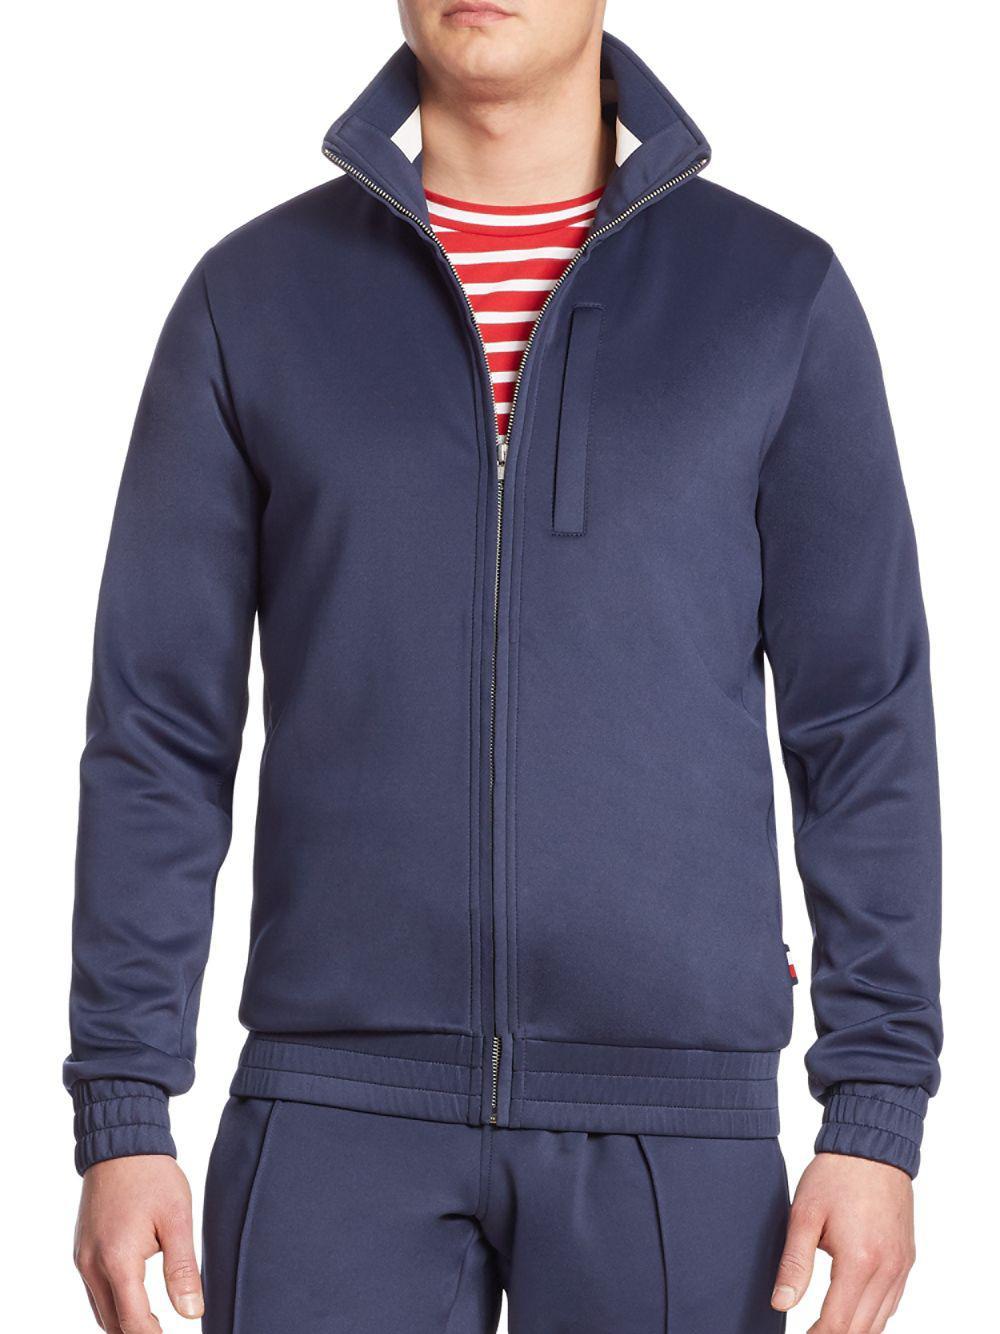 112cddb583e0 Lyst - Tommy Hilfiger Track Jacket in Blue for Men